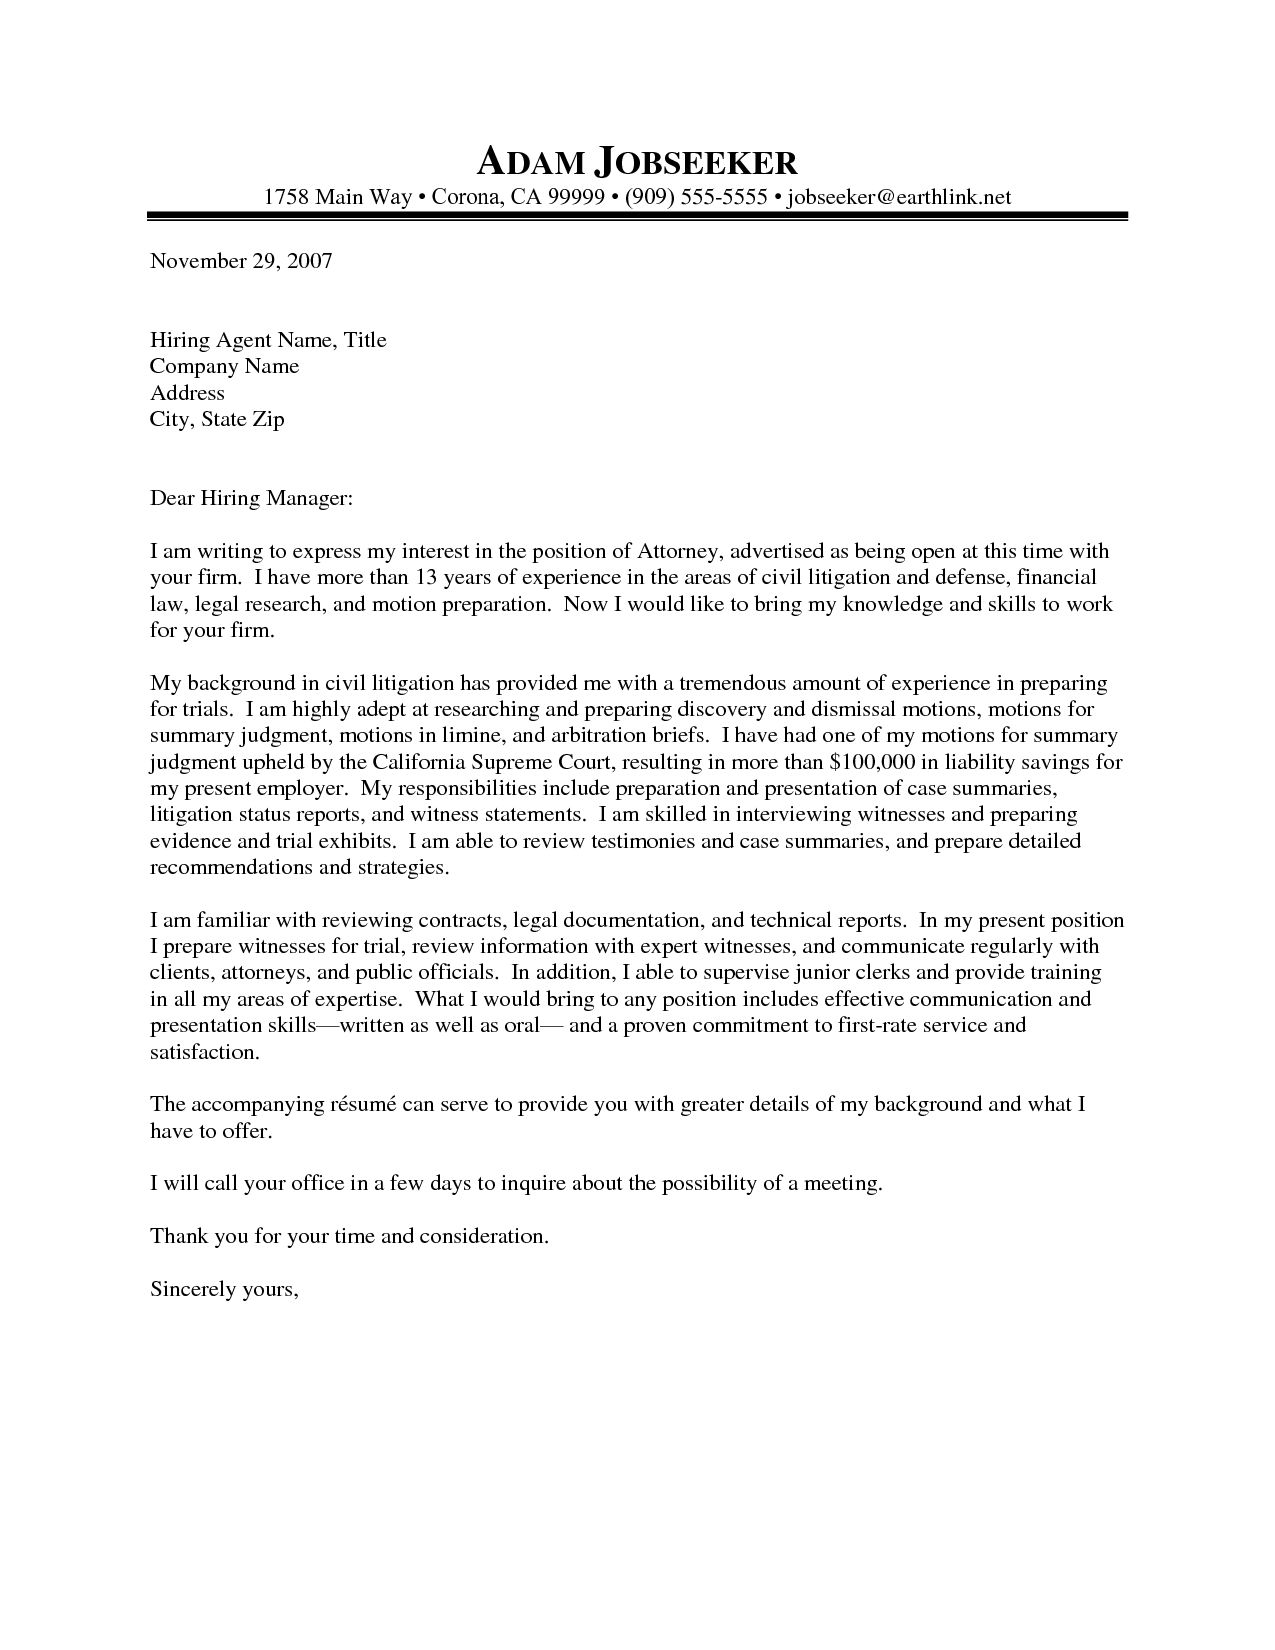 Law Firm Cover Letter Sample The Letter Sample Cover Letter Sample Law Firm  The Write Stuff